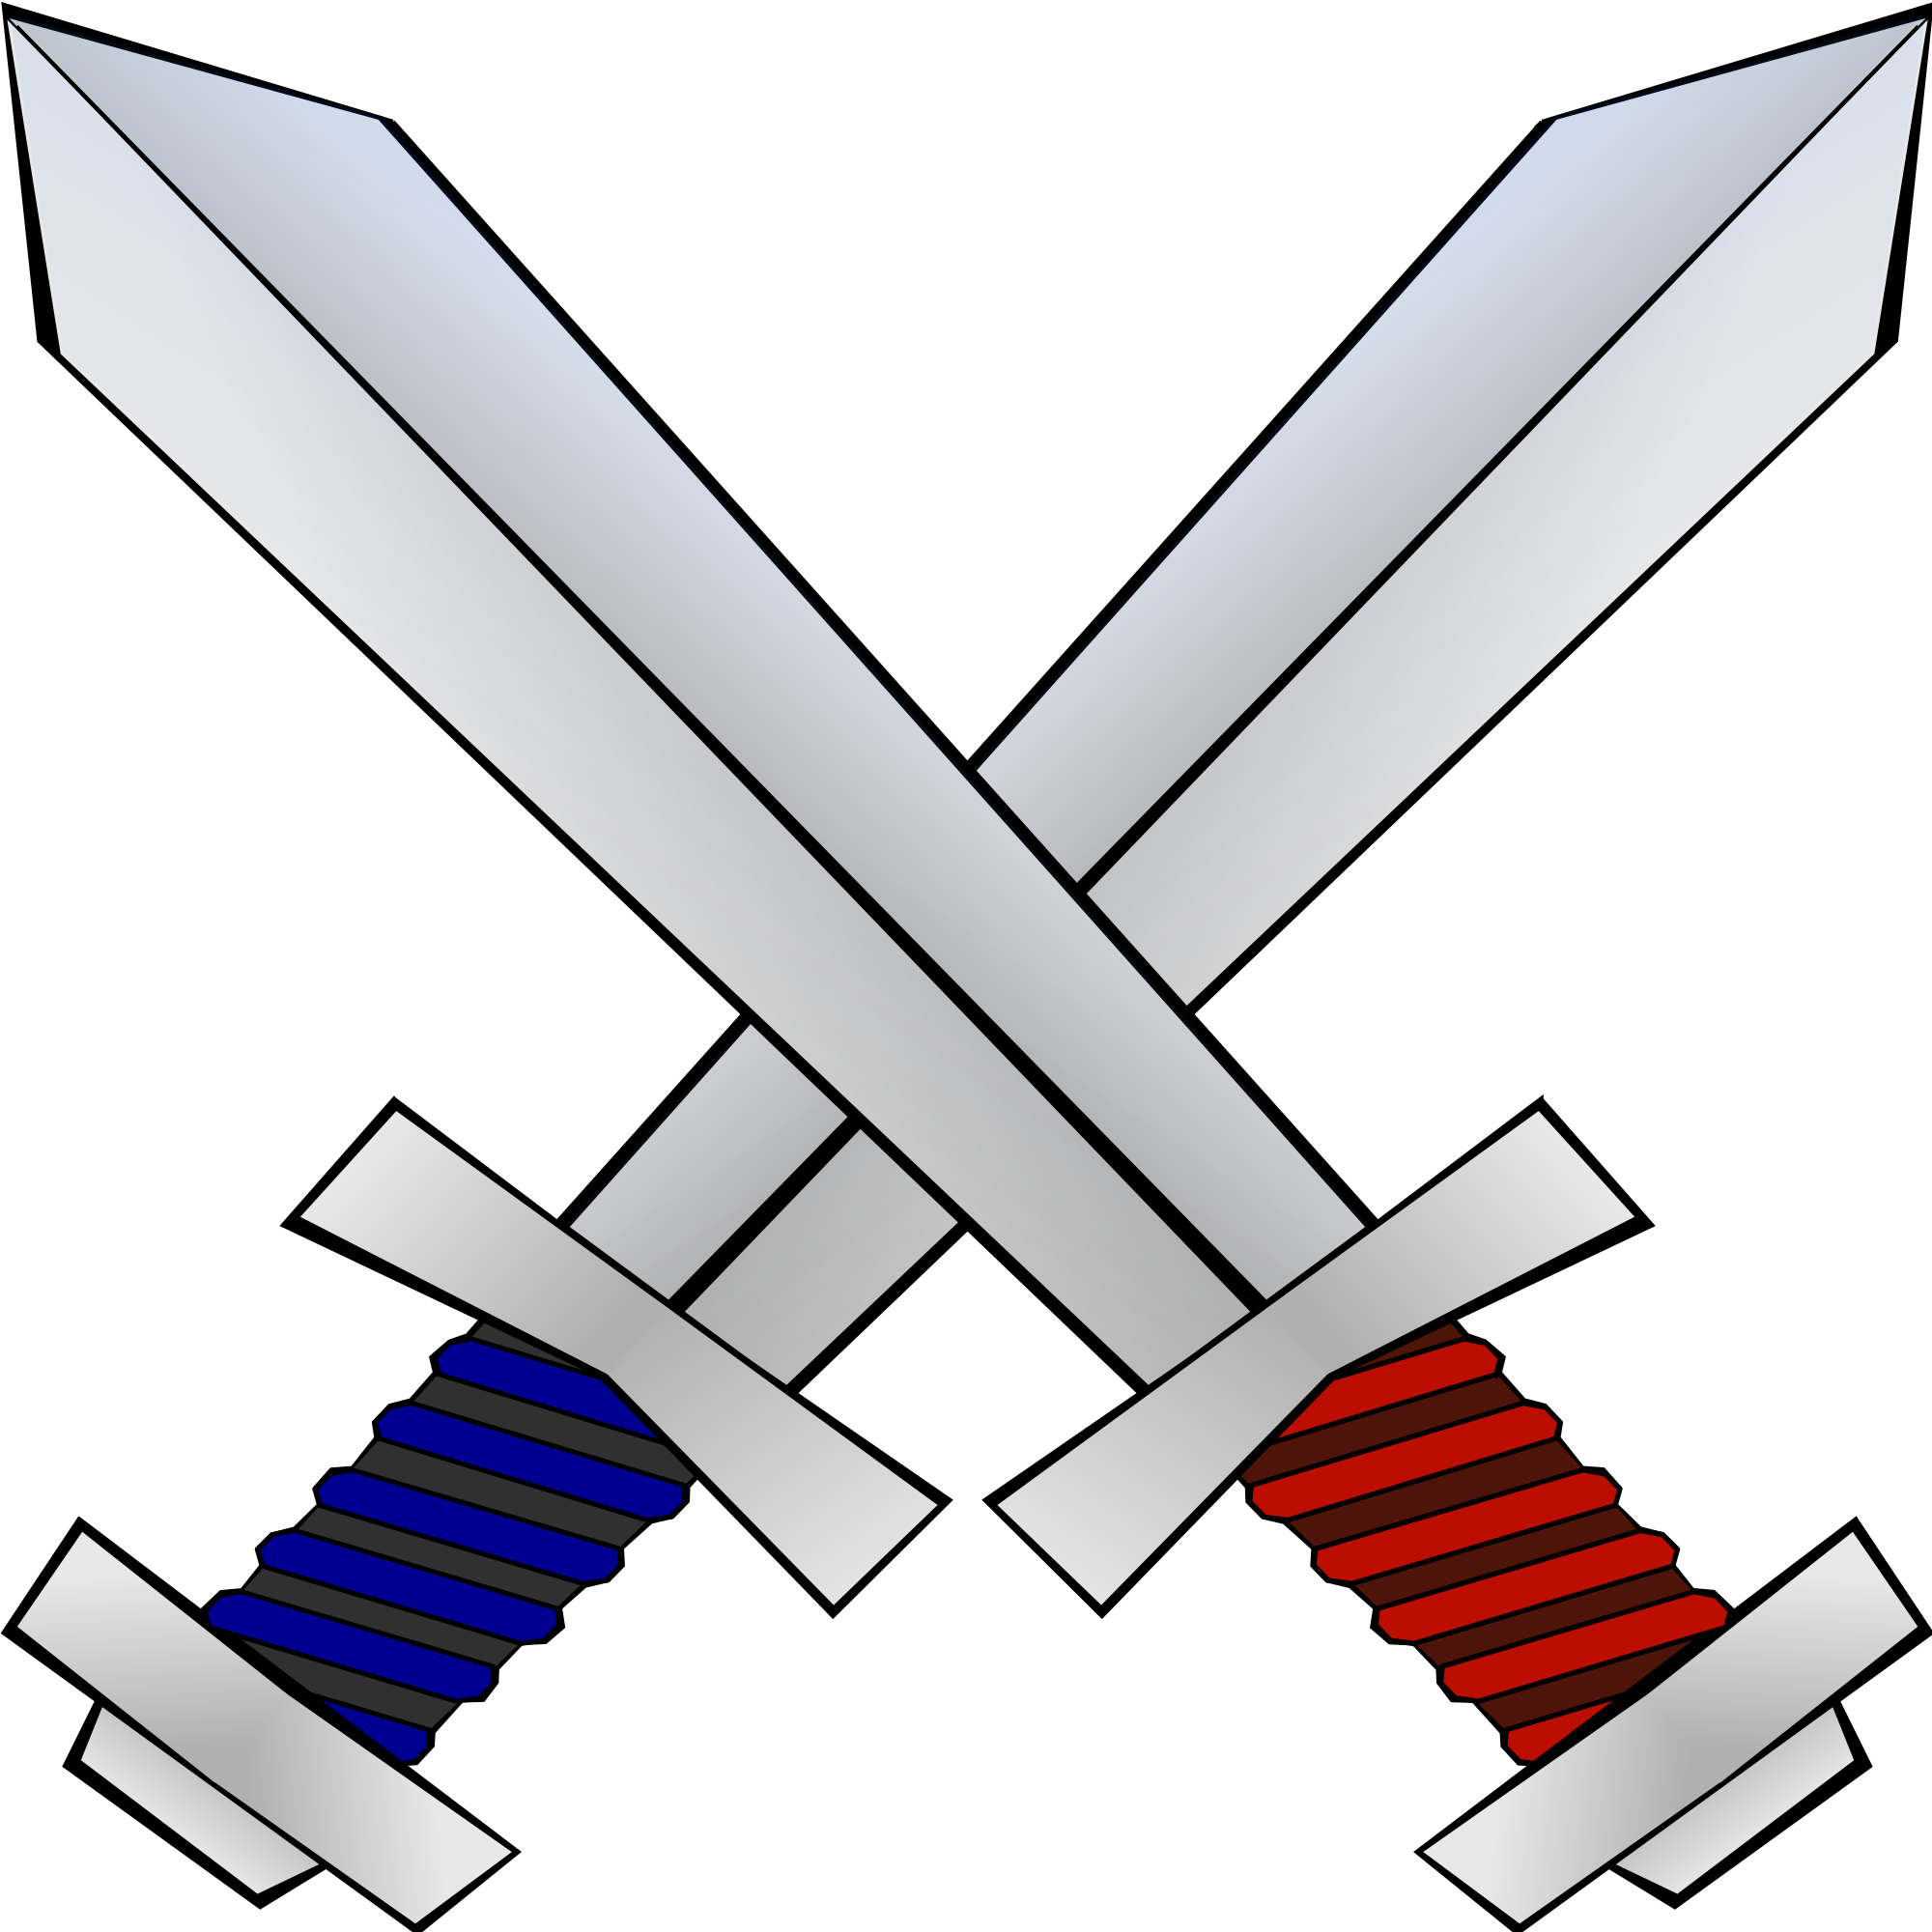 File swords svg wikimedia. Sword clipart cute